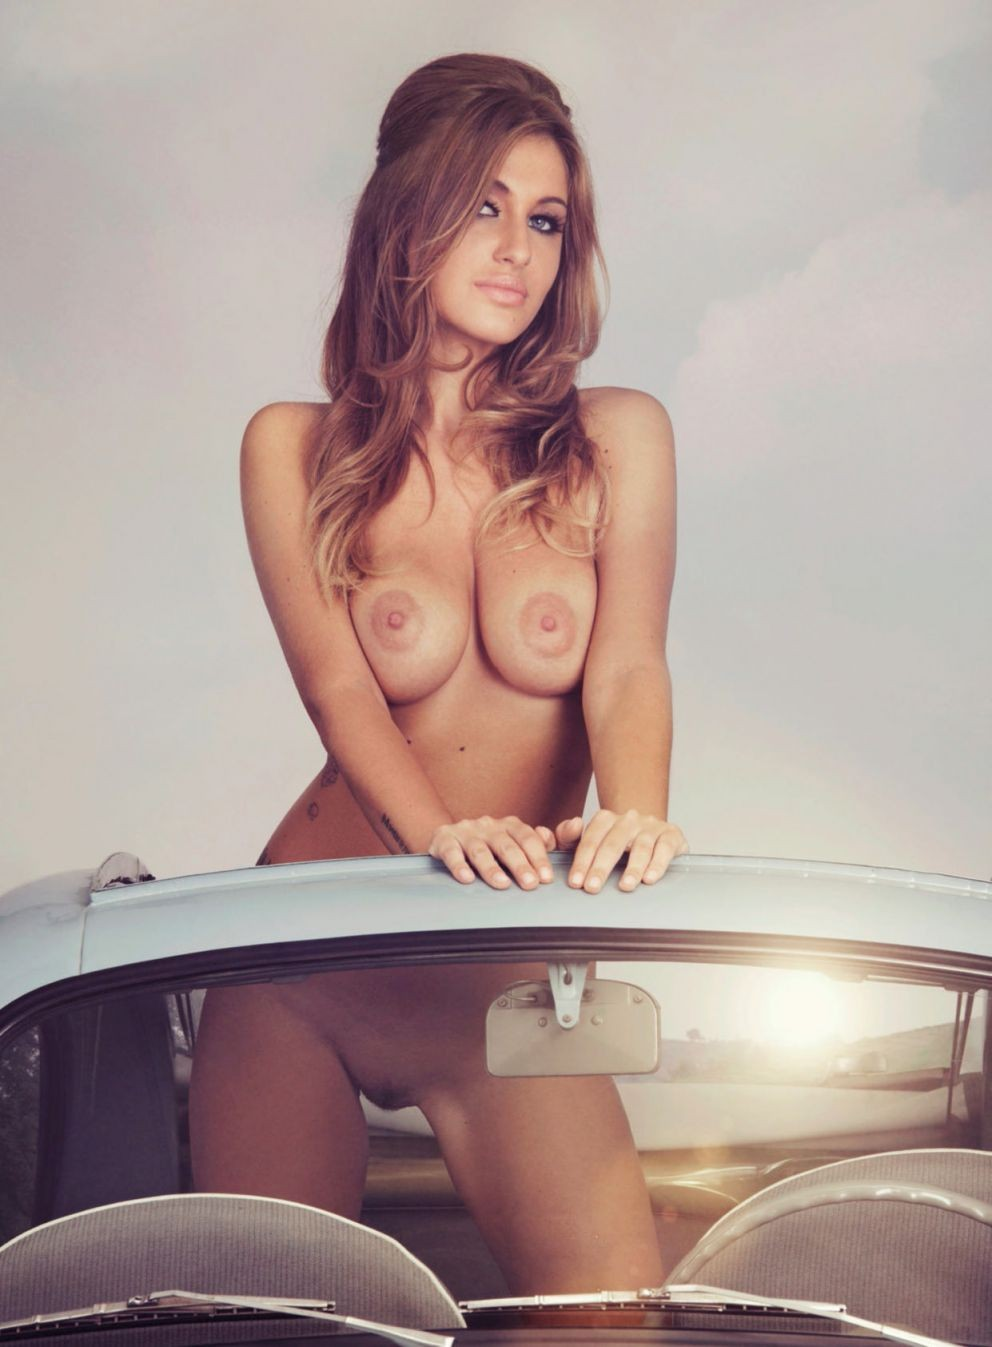 Elena Riz Nude Naked Pics And Videos Imperiodefamosas